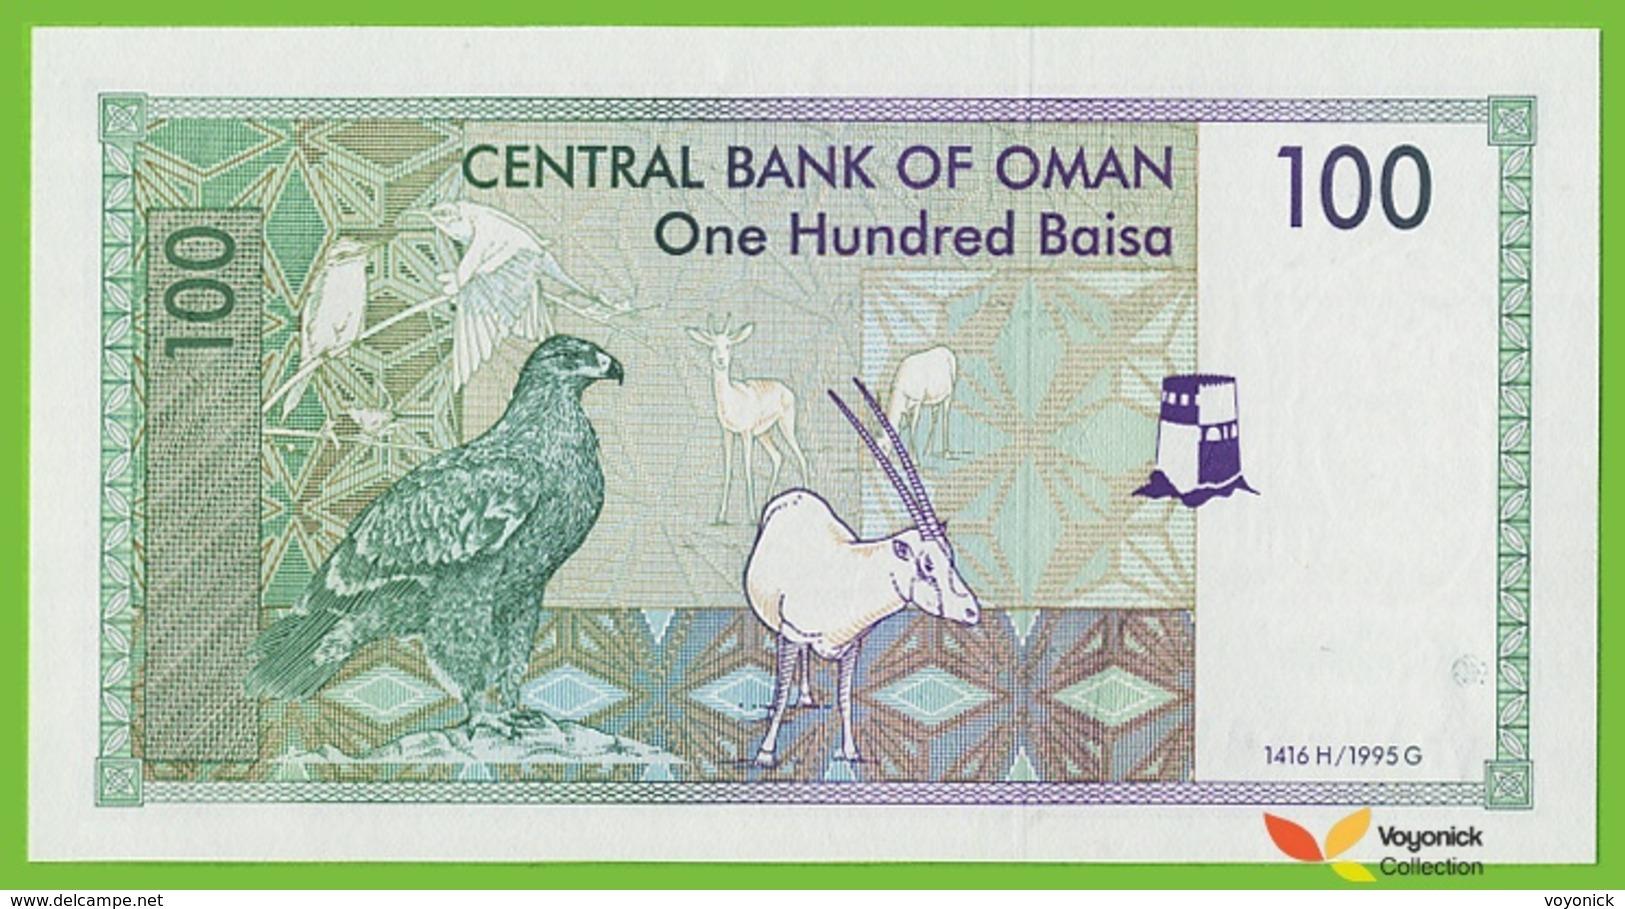 Voyo OMAN 100 Baisa 1995 P31 B219a ٧٠/ج UNC Eagle, Oryx - Oman